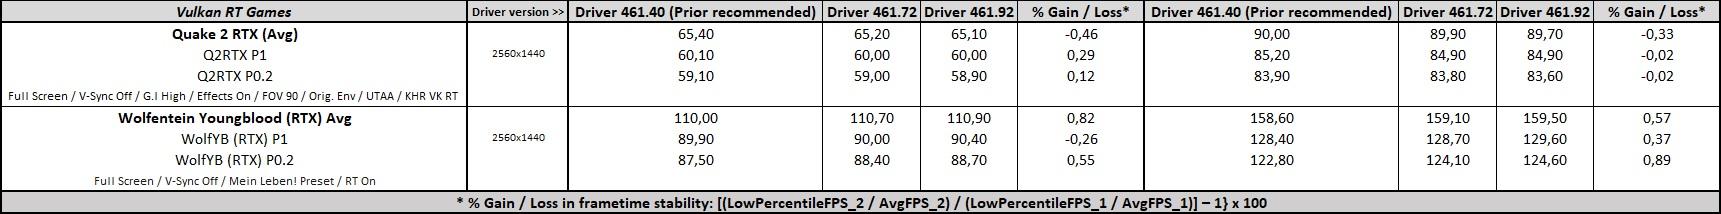 GeForce 461.92 Driver Performance